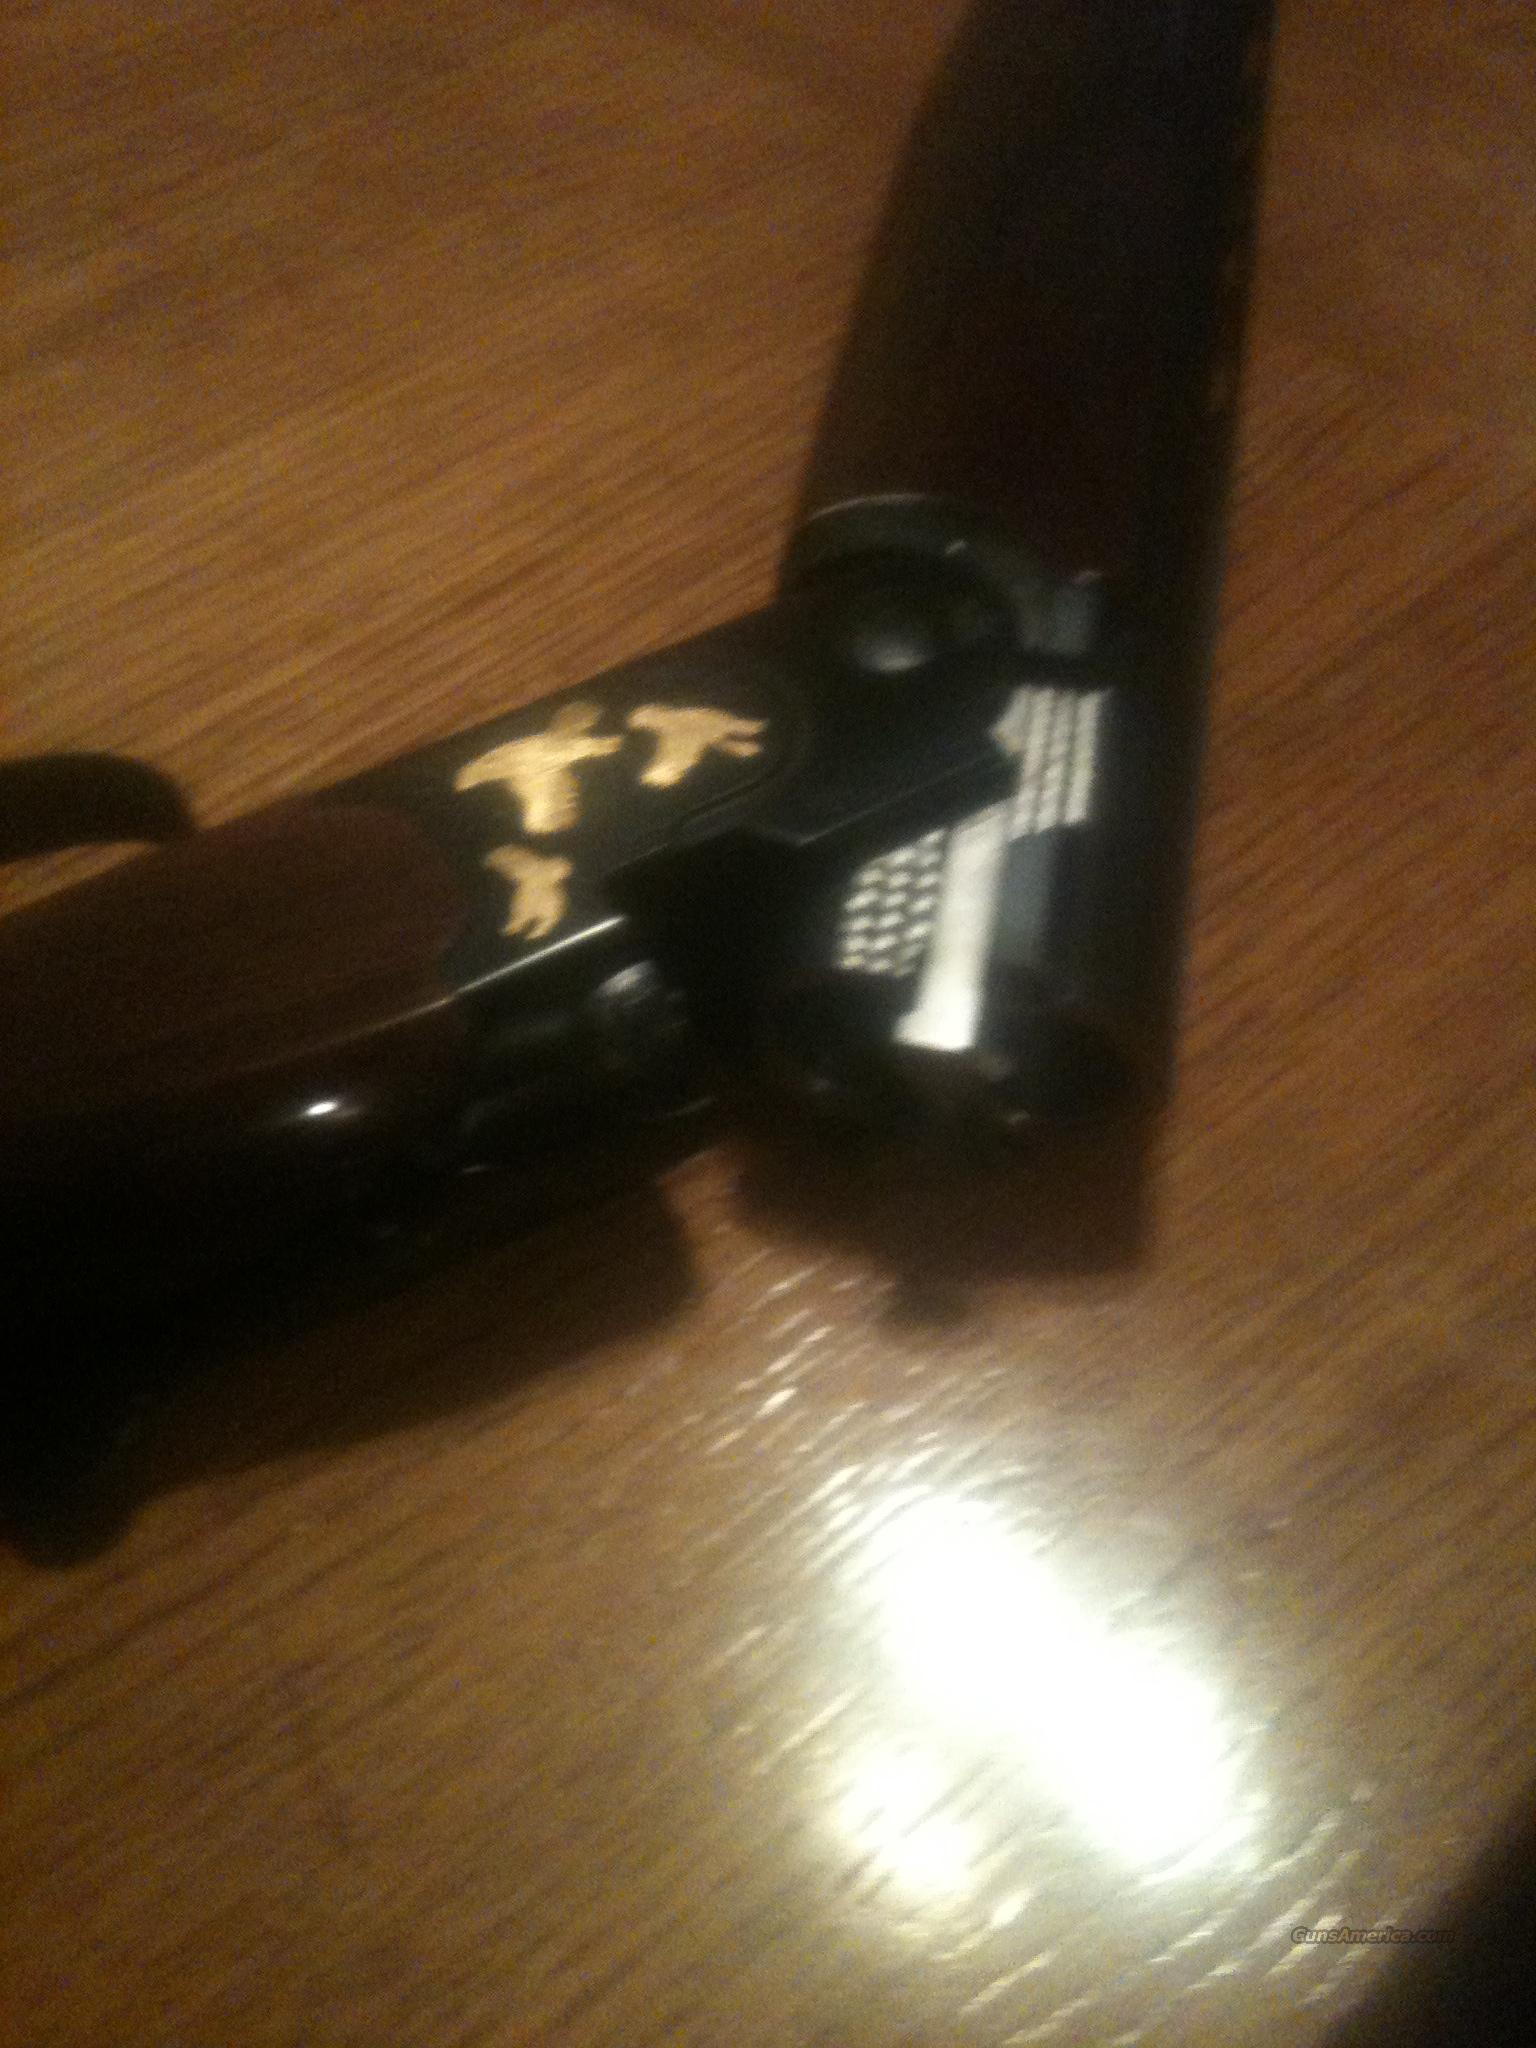 Beretta 20ga 686 covey quail  Guns > Shotguns > Beretta Shotguns > O/U > Hunting